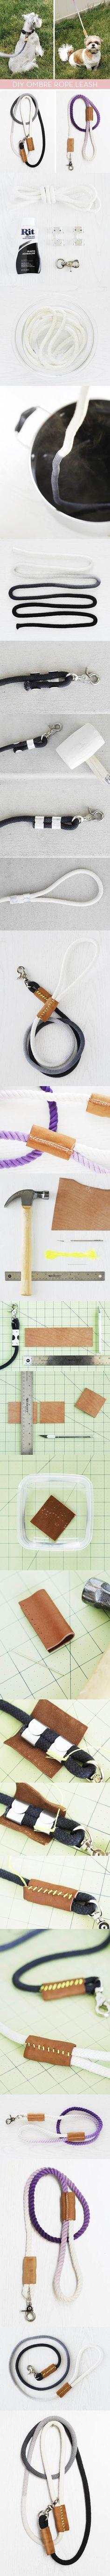 10 Stuning Diy Dog Collar Ideas You Will Love >>  ❤ See more: http://fallinpets.com/stuning-diy-dog-collar-ideas-will-love/ ❤ See more: http://fallinpets.com/diy-dog-feeding-station-ideas-pet-will-like/